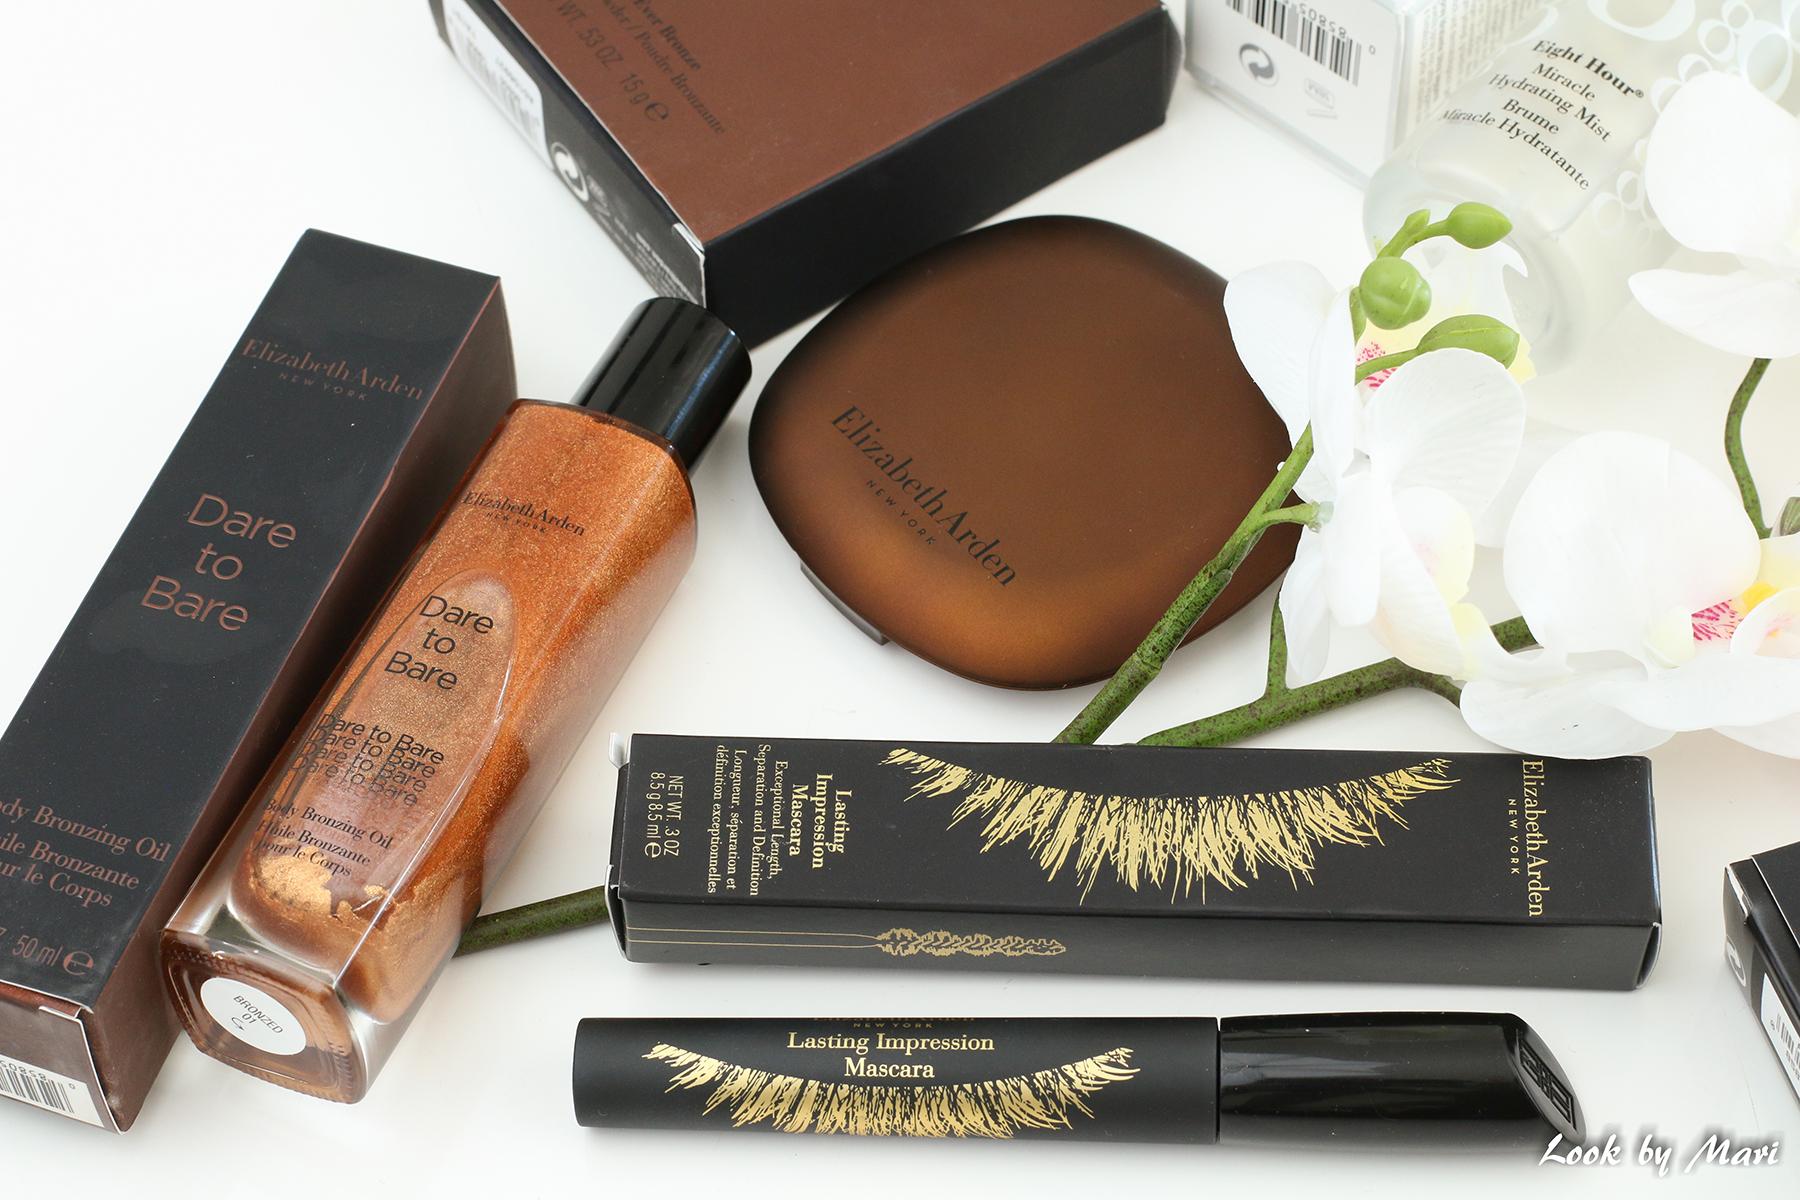 2 elizabeth arden bronzing oil review mascara stockmann